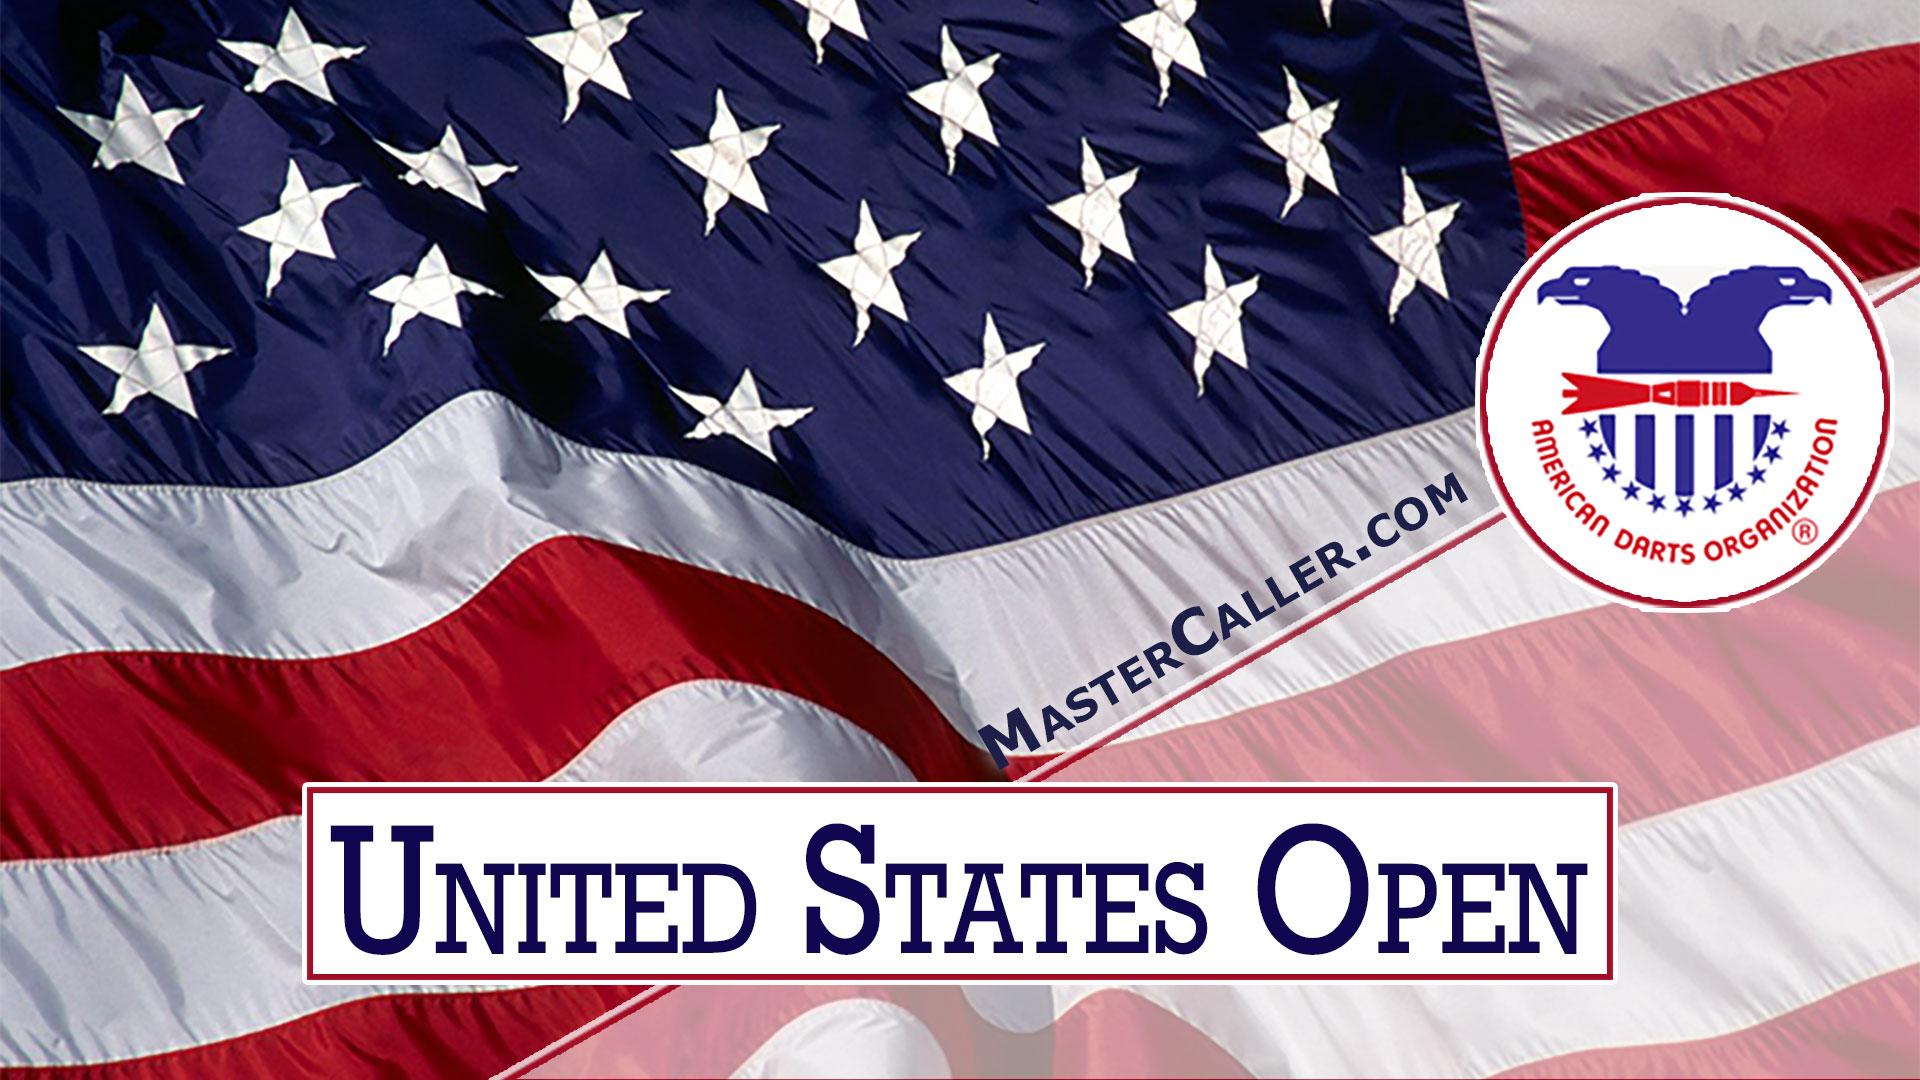 United States Open Men - 1975 Logo